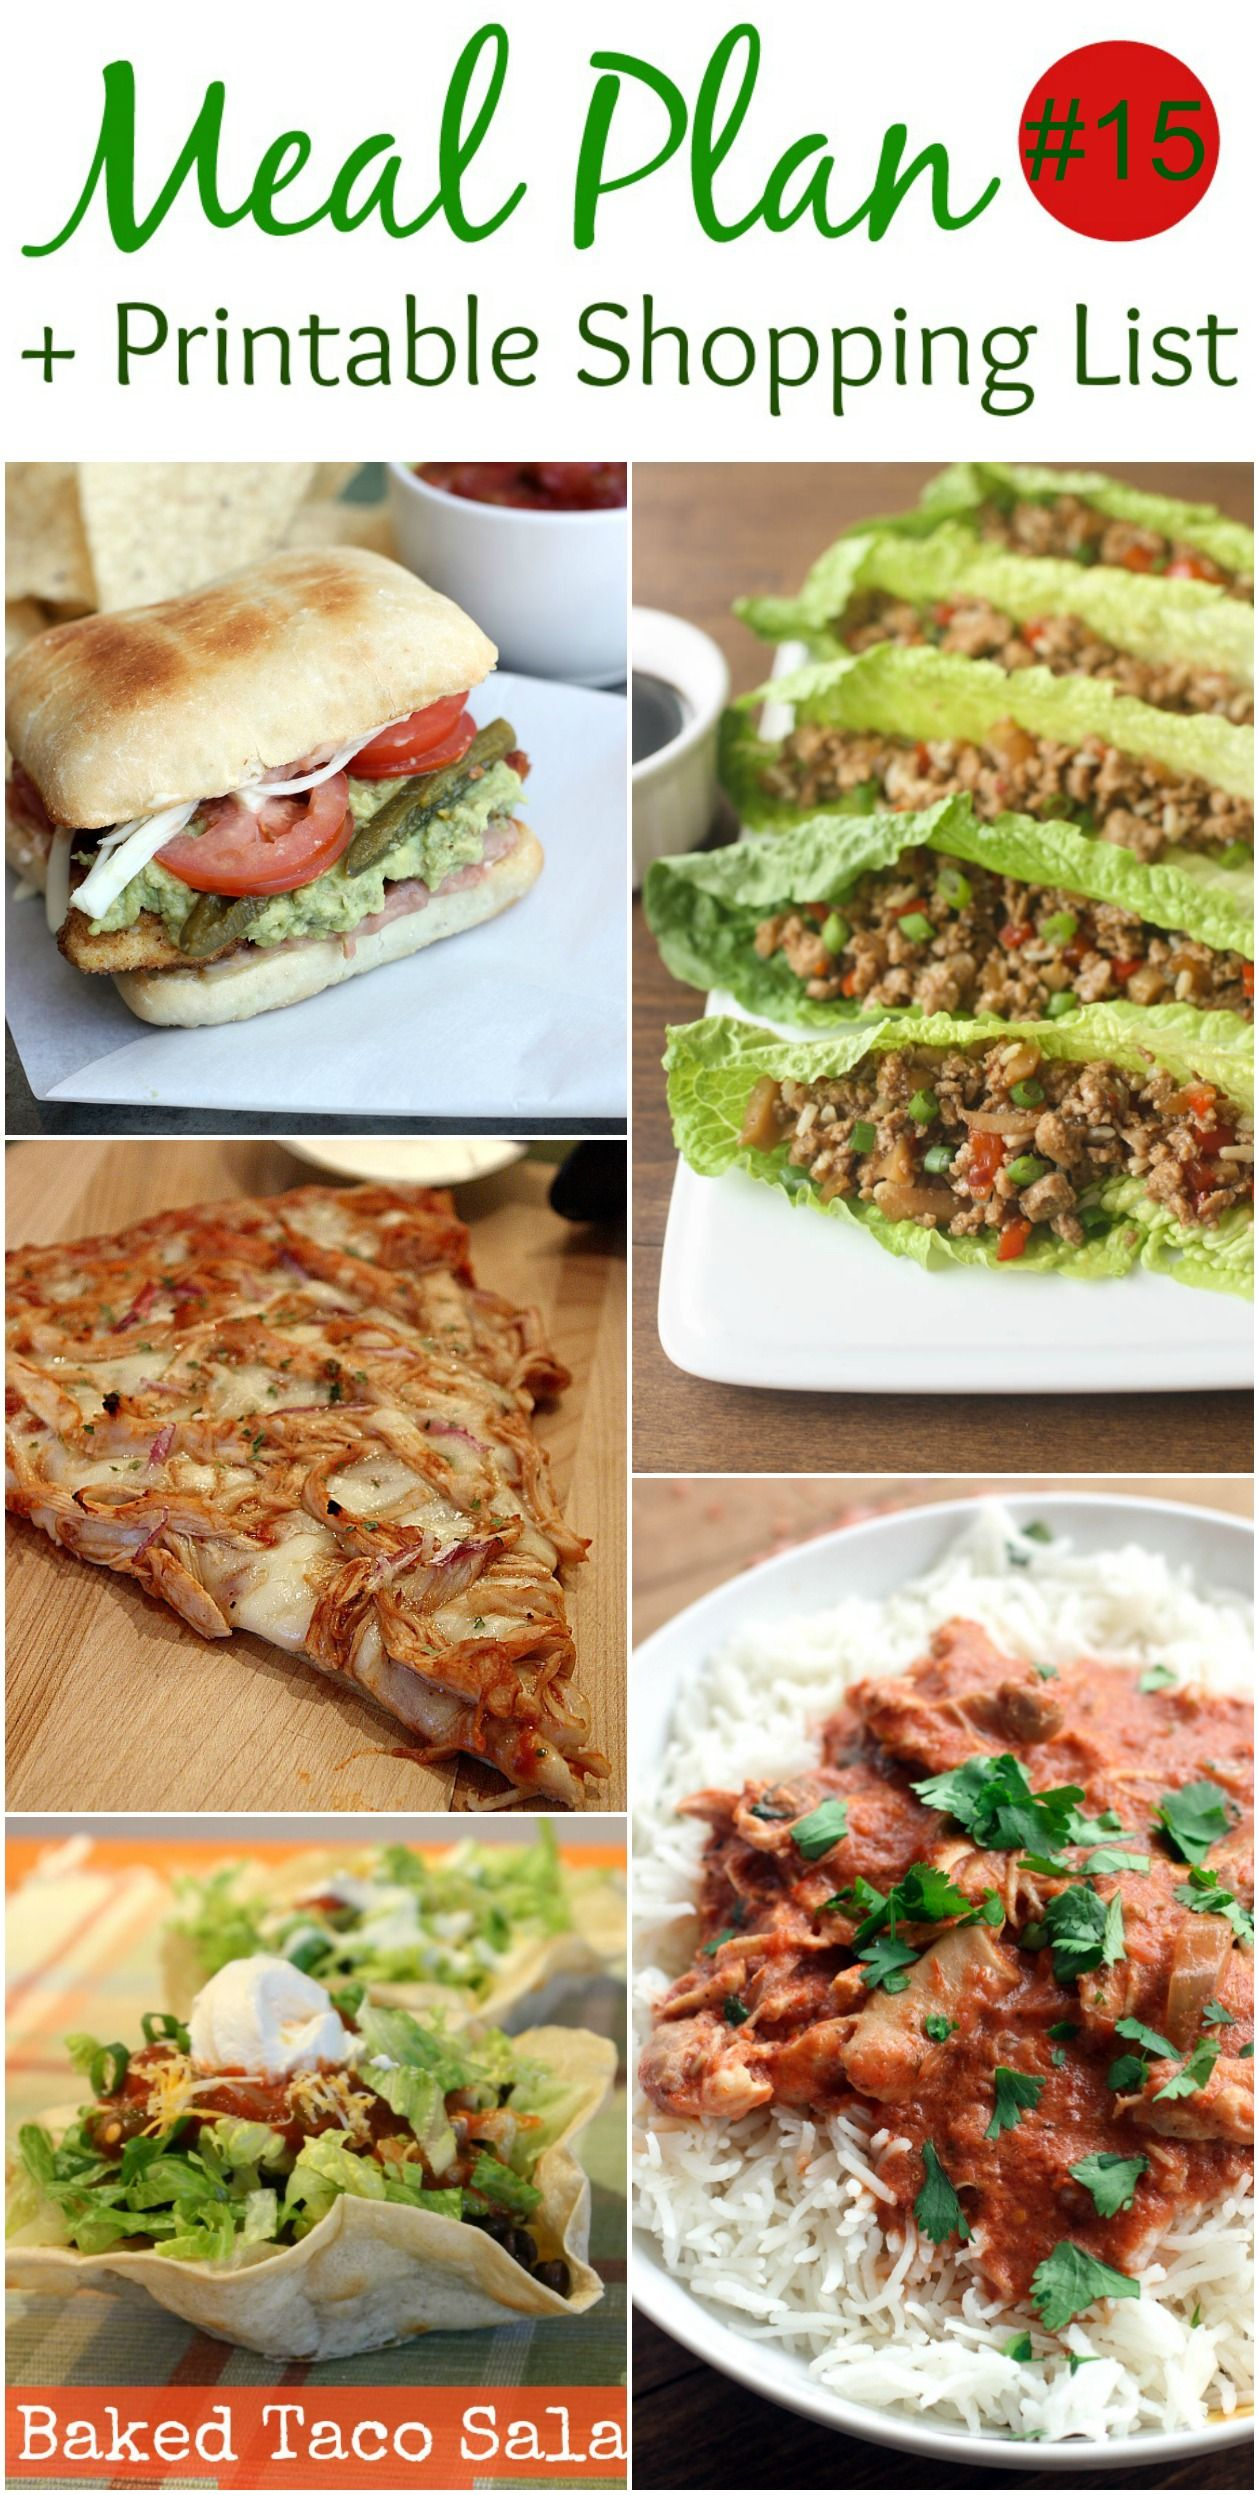 Weekly Meal Plan 15